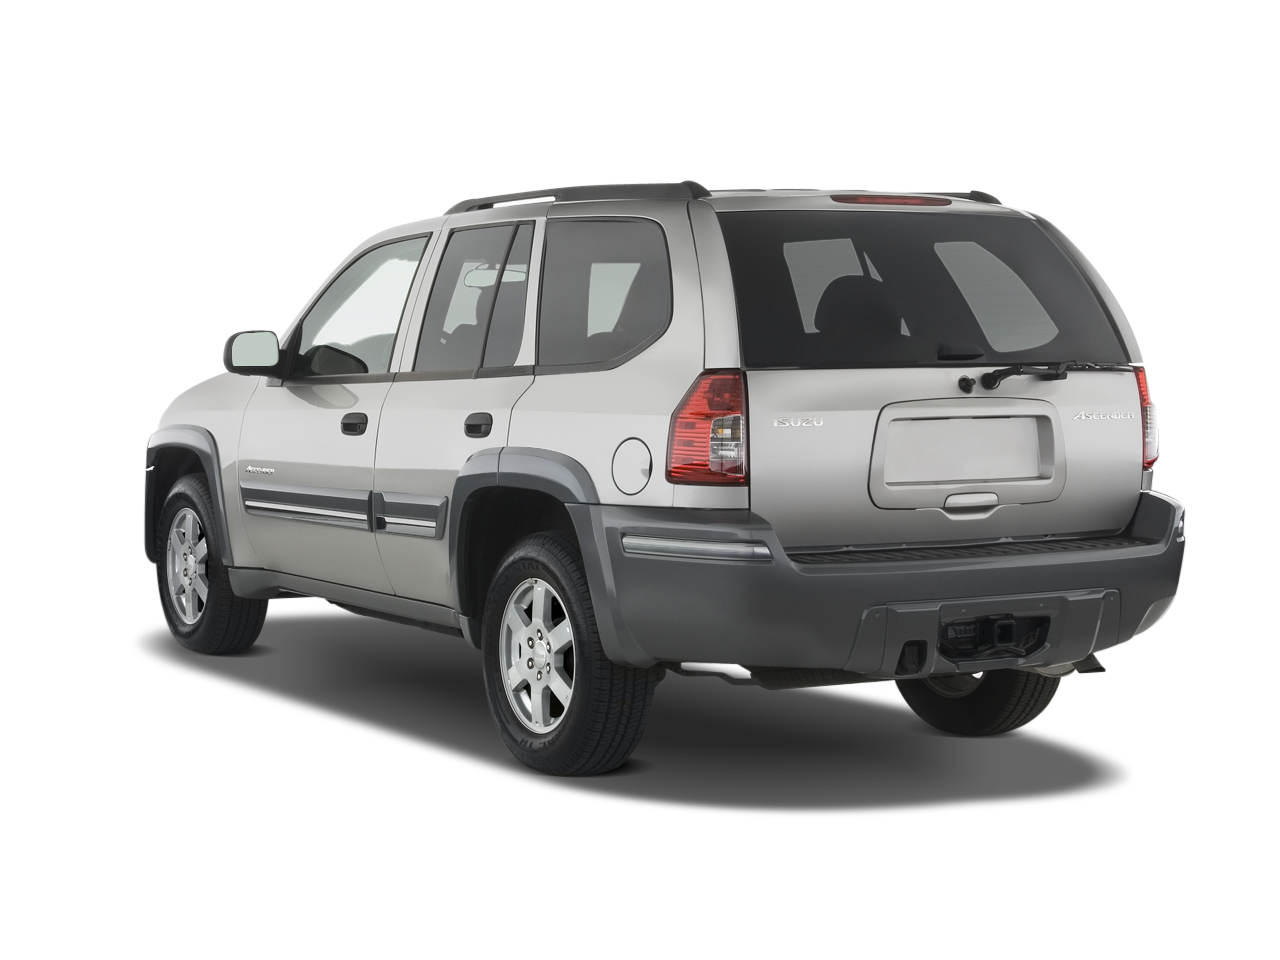 Isuzu Ascender 2002 - 2008 SUV 5 door #2